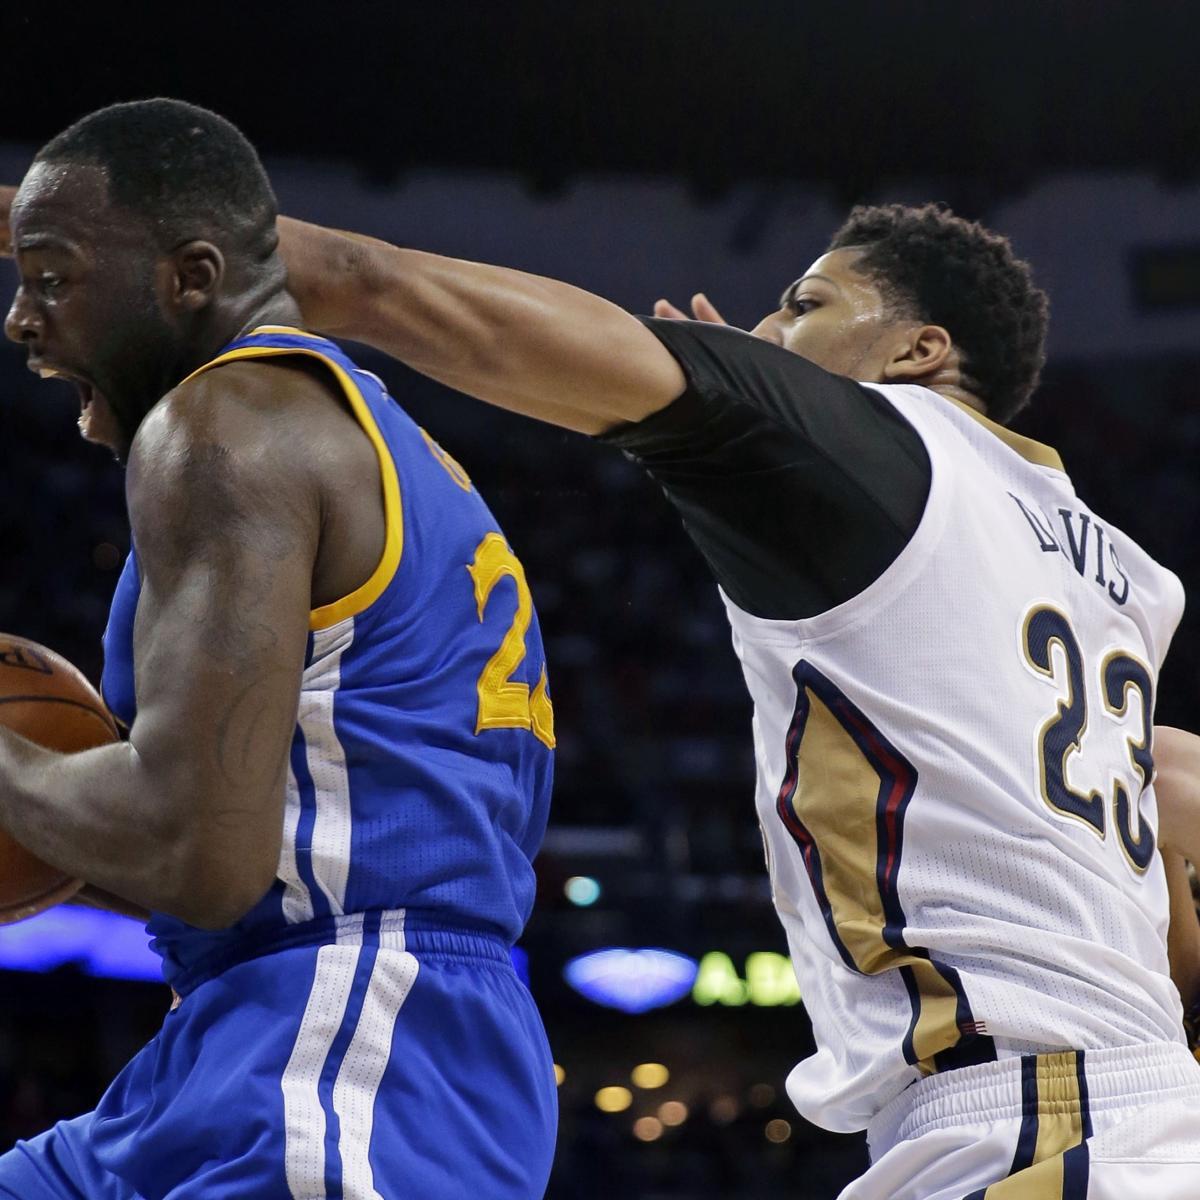 Golden State Warriors Vs Wizards Full Game Highlights: Golden State Warriors Vs. New Orleans Pelicans 4/7/15